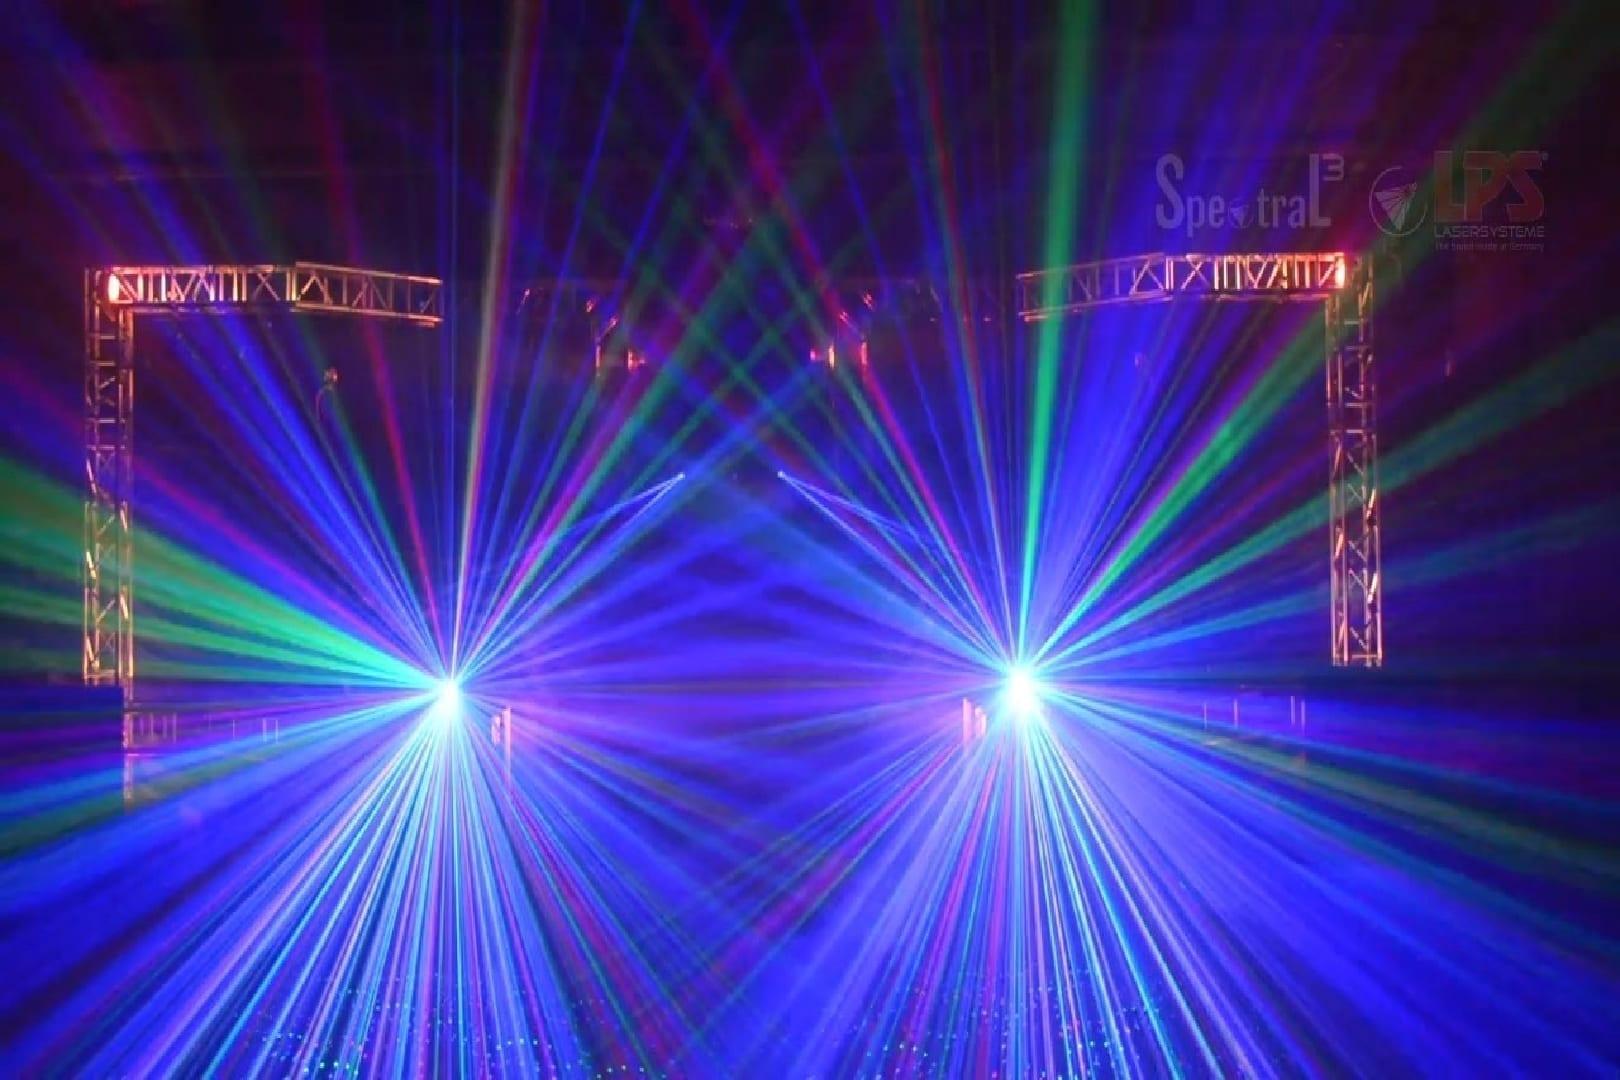 Spektral Effekt